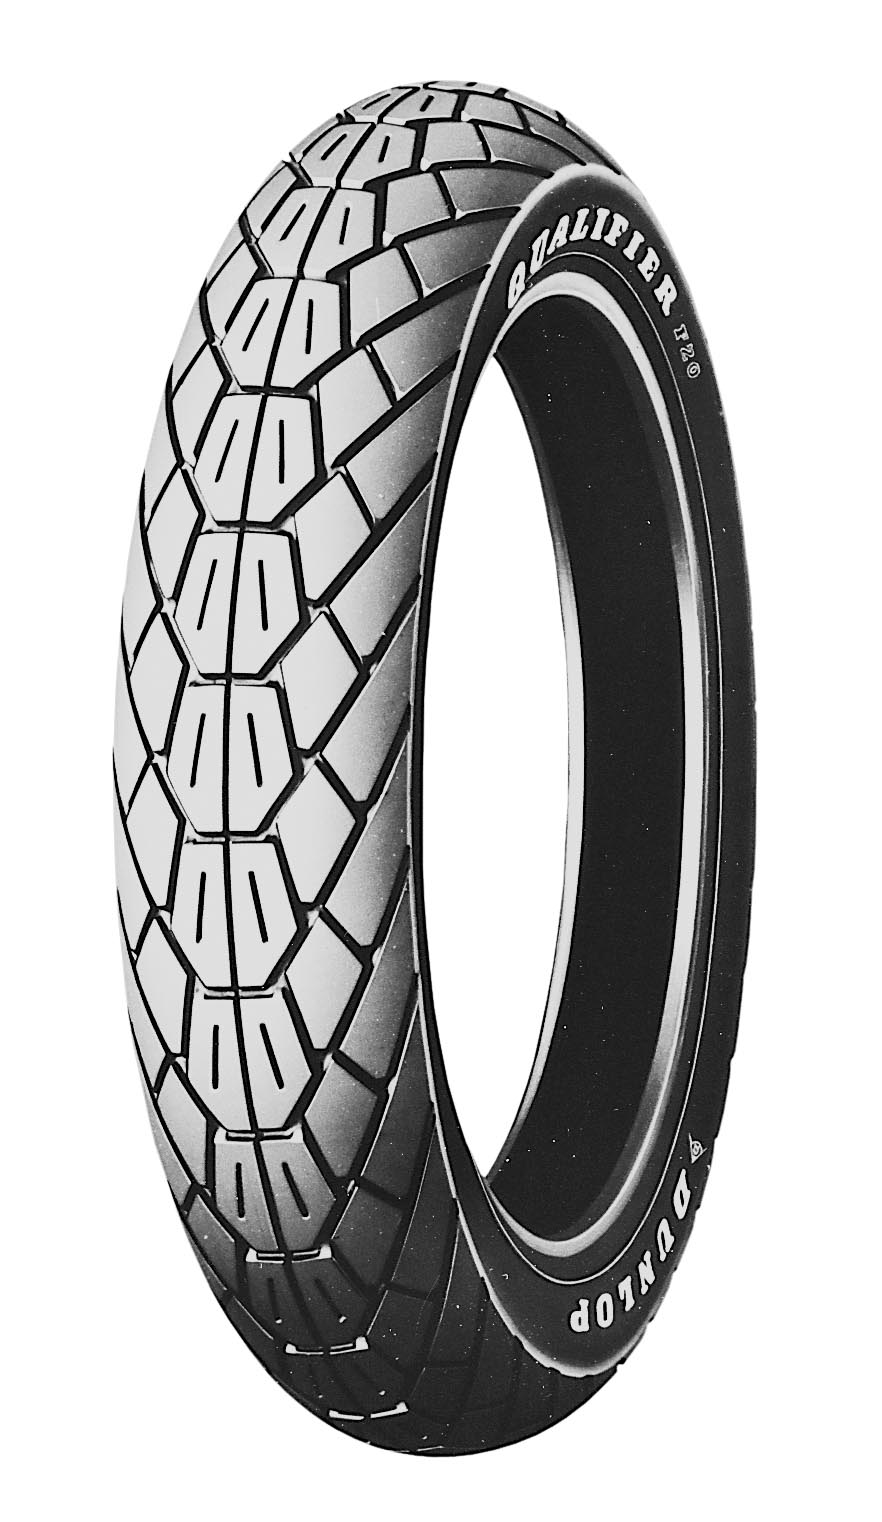 Dunlop F20 Qualifier Tire